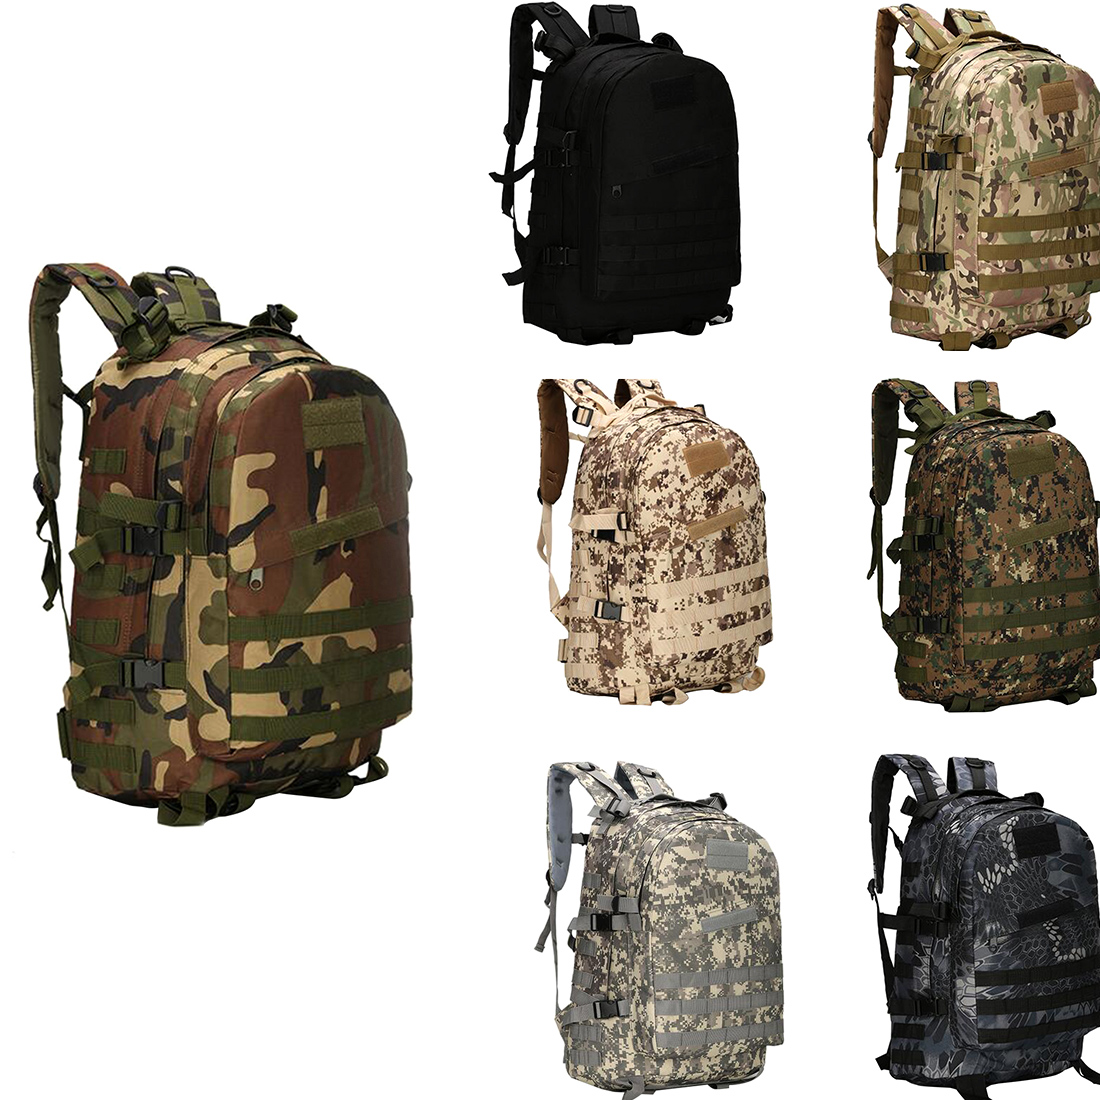 Outdoor Sport Nylon Military Tactical Backpack Rucksack Travel Bag Camping Hiking Climbing Bag molle outdoor climbing bags military tactical backpack single shoulder bag sport backpack camping hiking bag travel rucksack bag